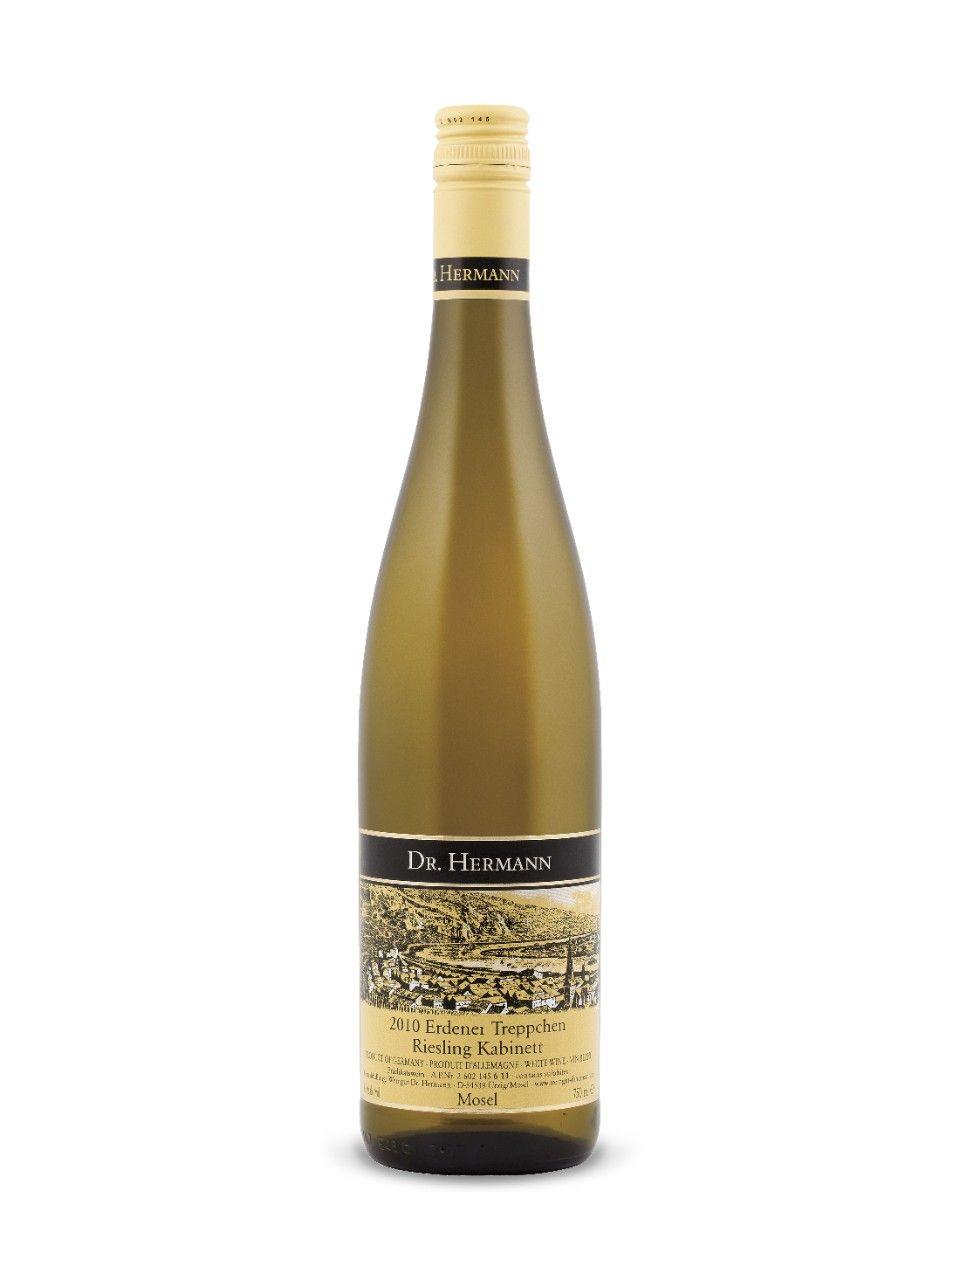 Dr. Hermann Erdener Treppchen Riesling Kabinett 2010  Pradikätswein, Mosel, Germany  Natalie's Score: 90/100  http://www.nataliemaclean.com/wine-reviews/dr-hermann-erdener-treppchen-riesling-kabinett-2010/214429  #wine